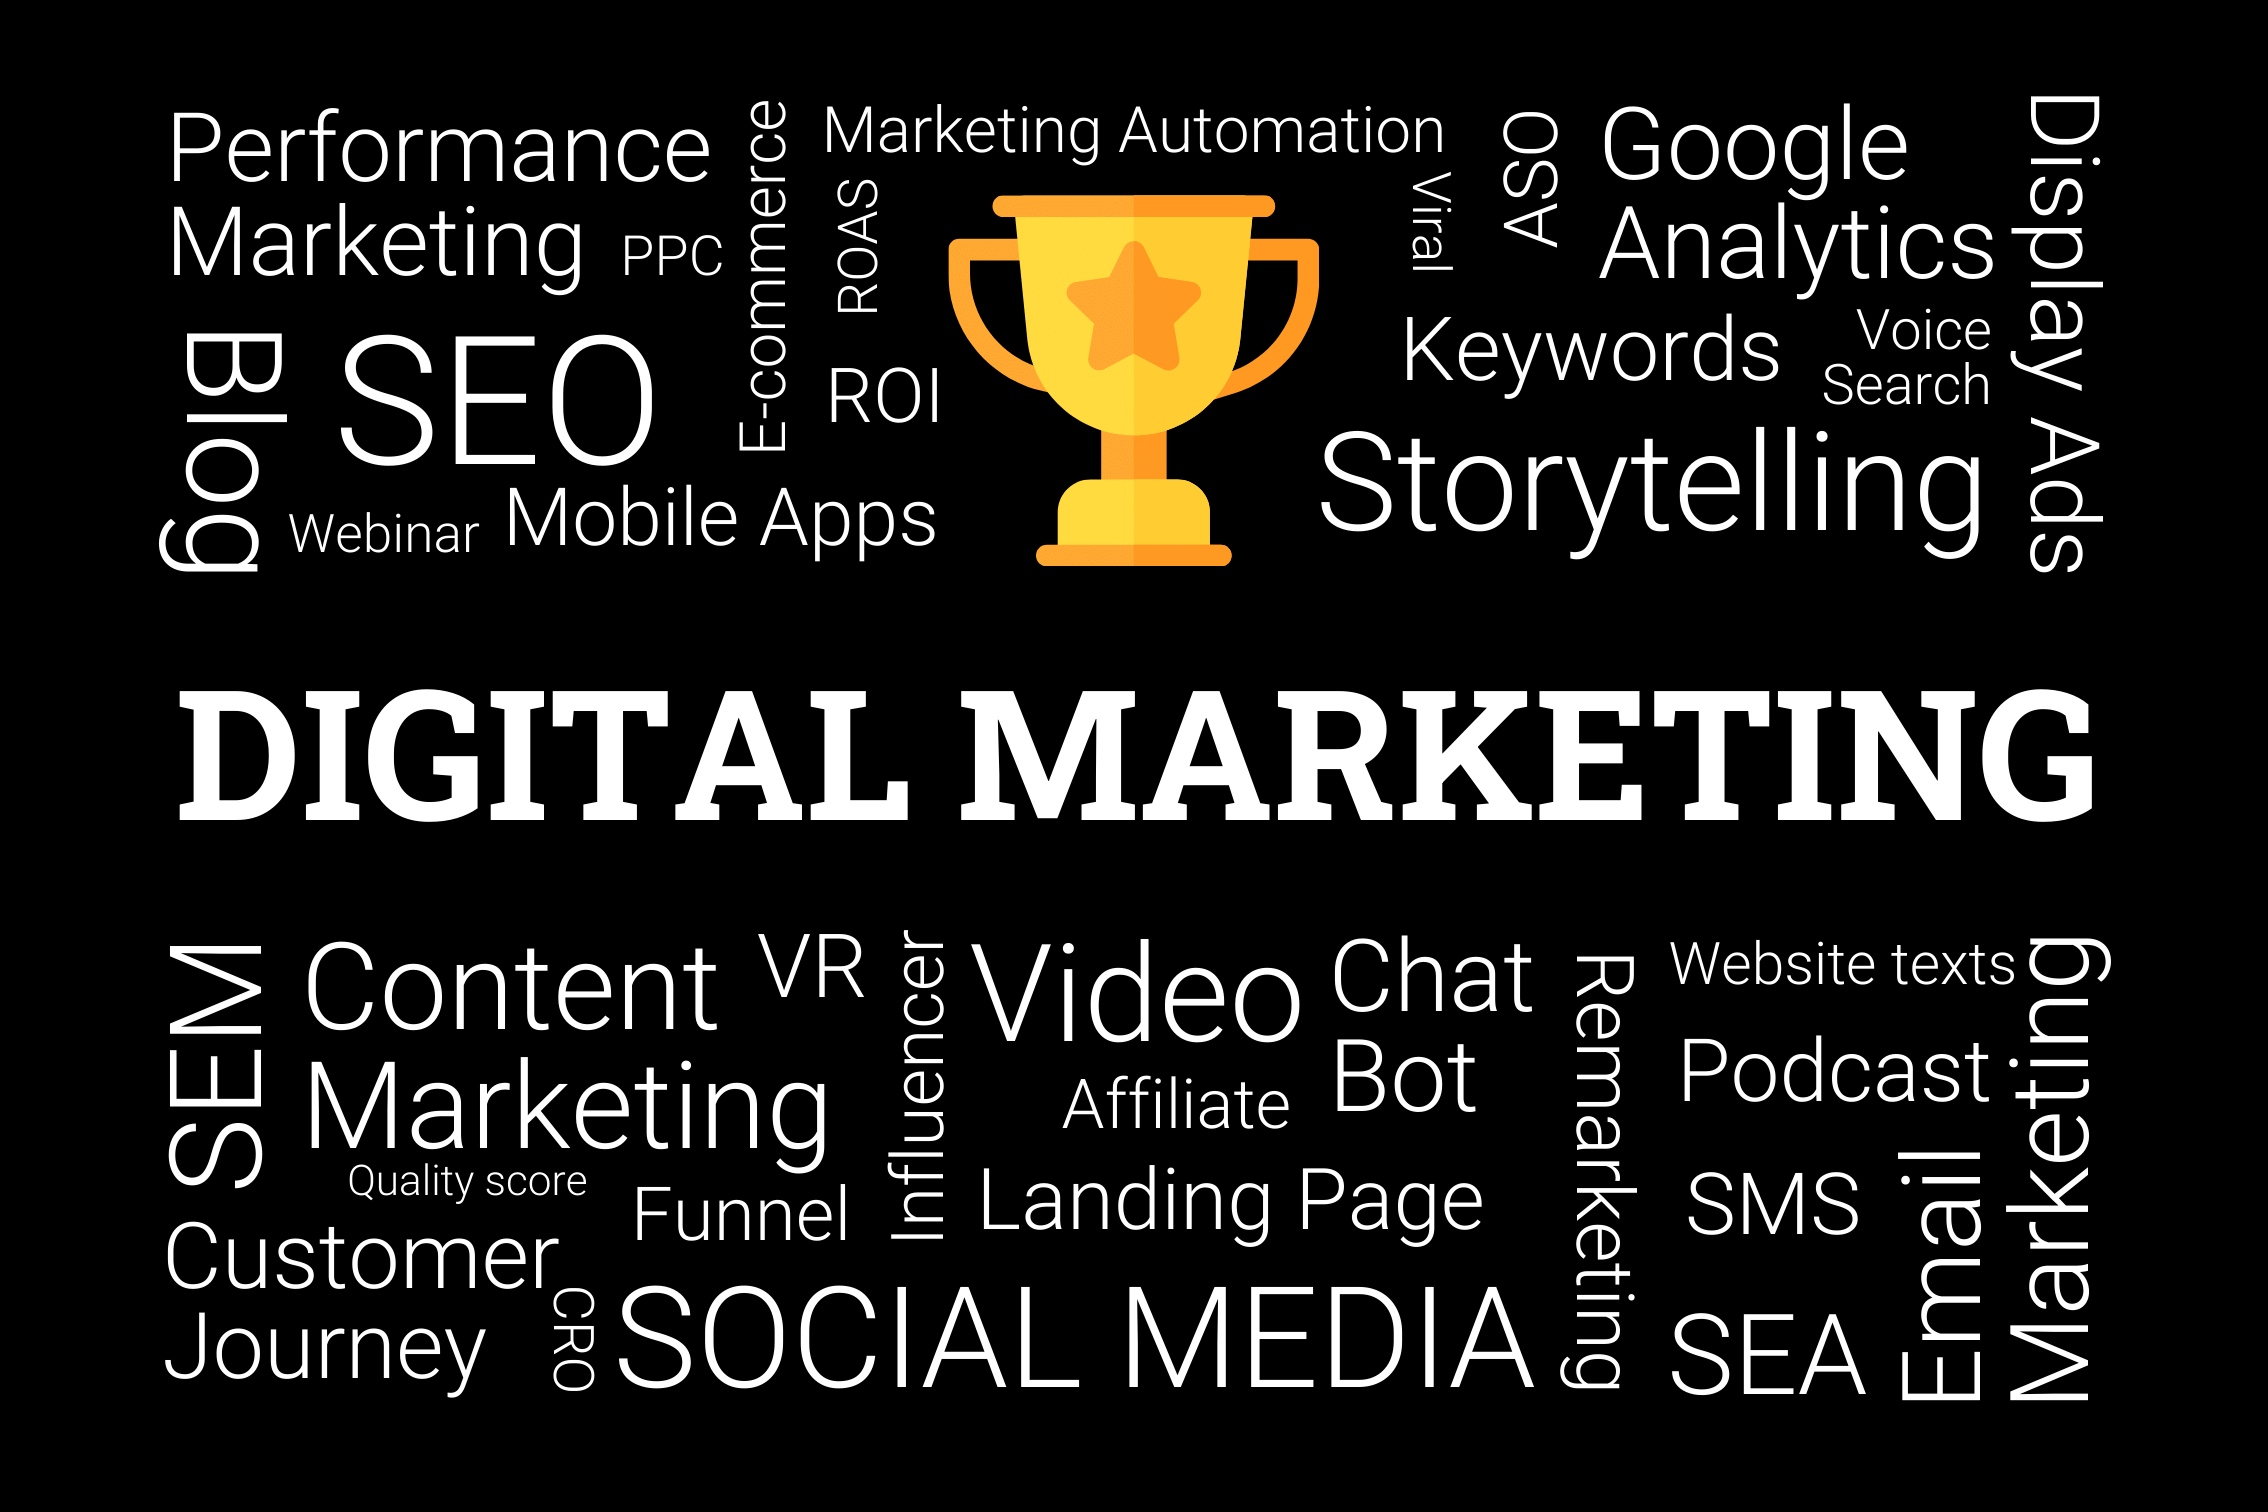 Digital Marketing Word Cloud von Wunderbox Marketing